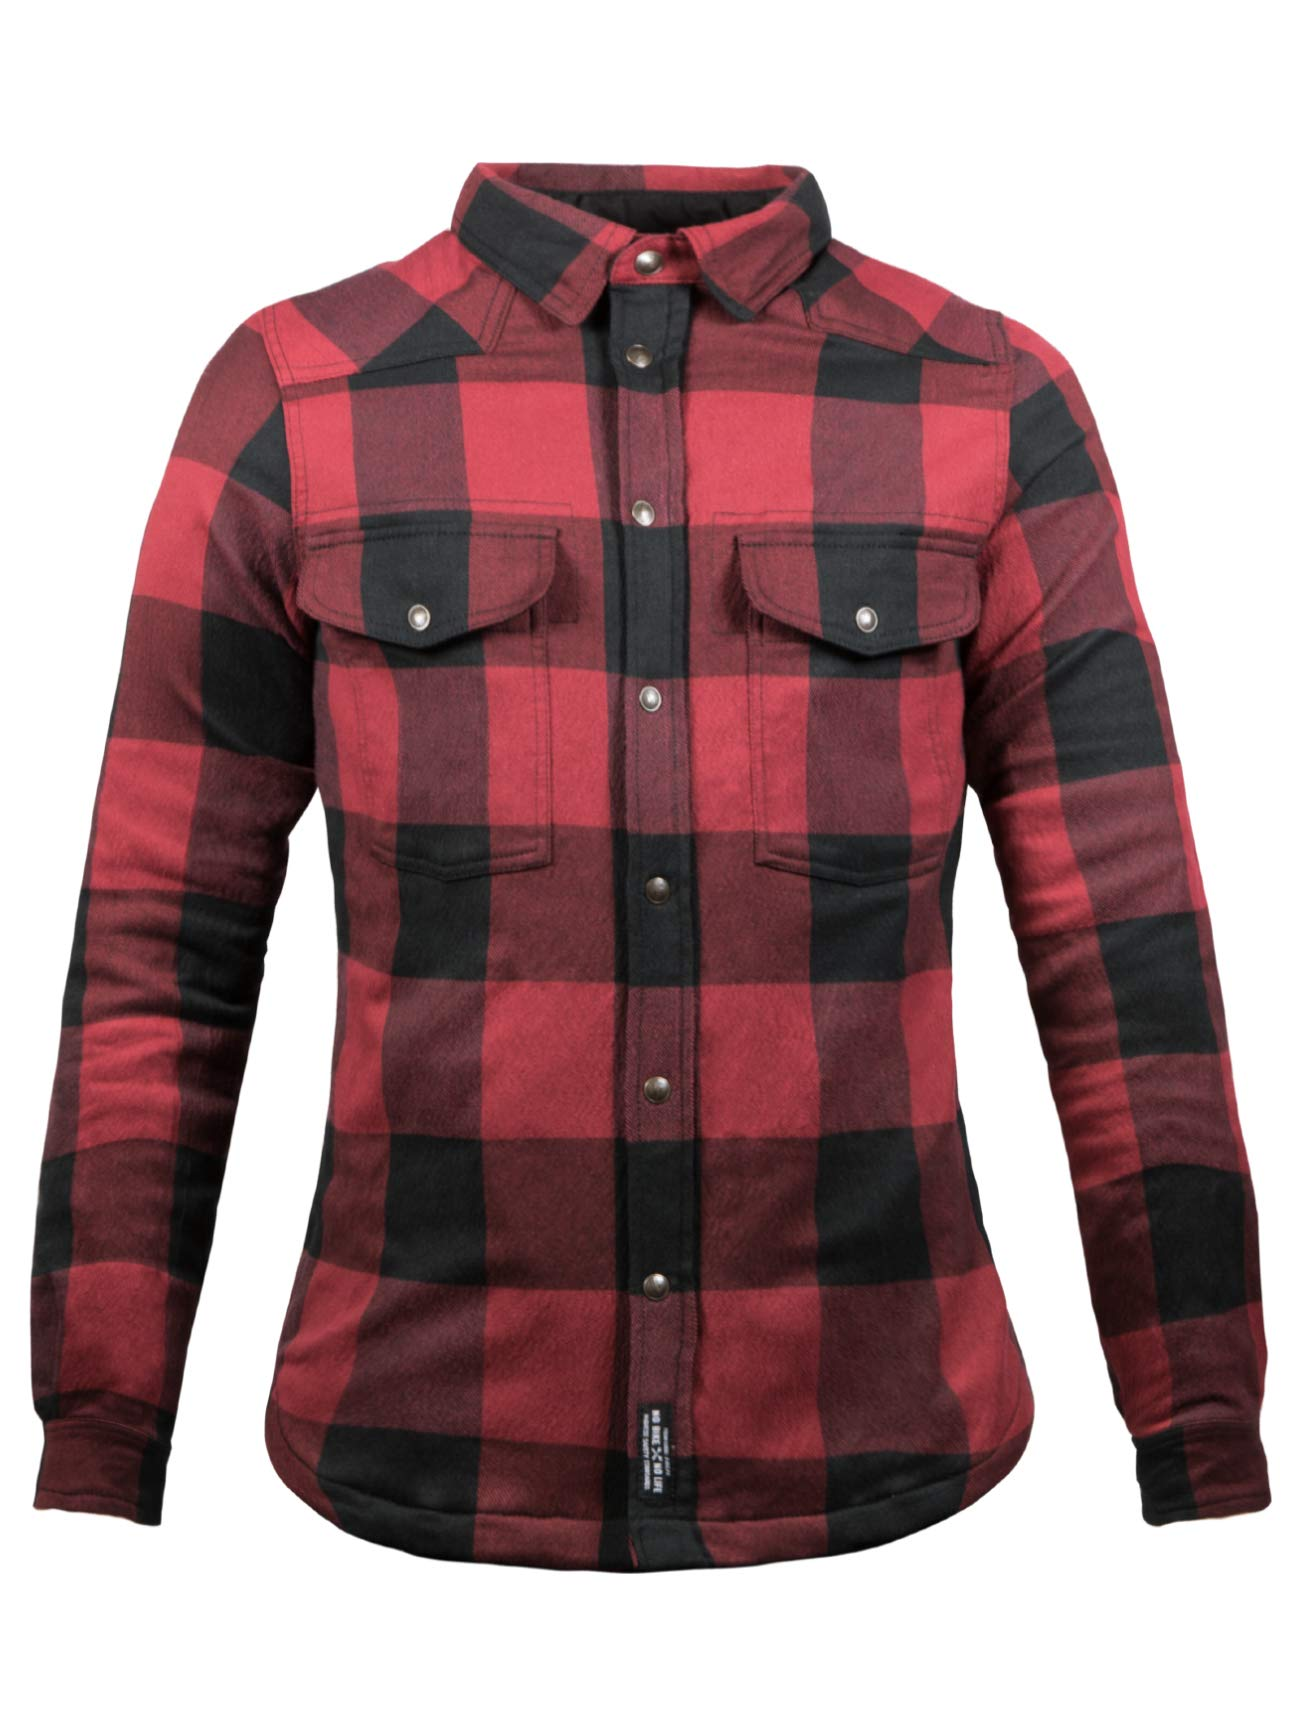 John Doe Damen Motoshirt XTM - Black/Red | Motorradjacke mit Kevlar | XTM Made with DuPont Kevlar | Einsetzbare Protektoren | Atmungsaktiv | Motorrad Motoshirt: Amazon.es: Coche y moto